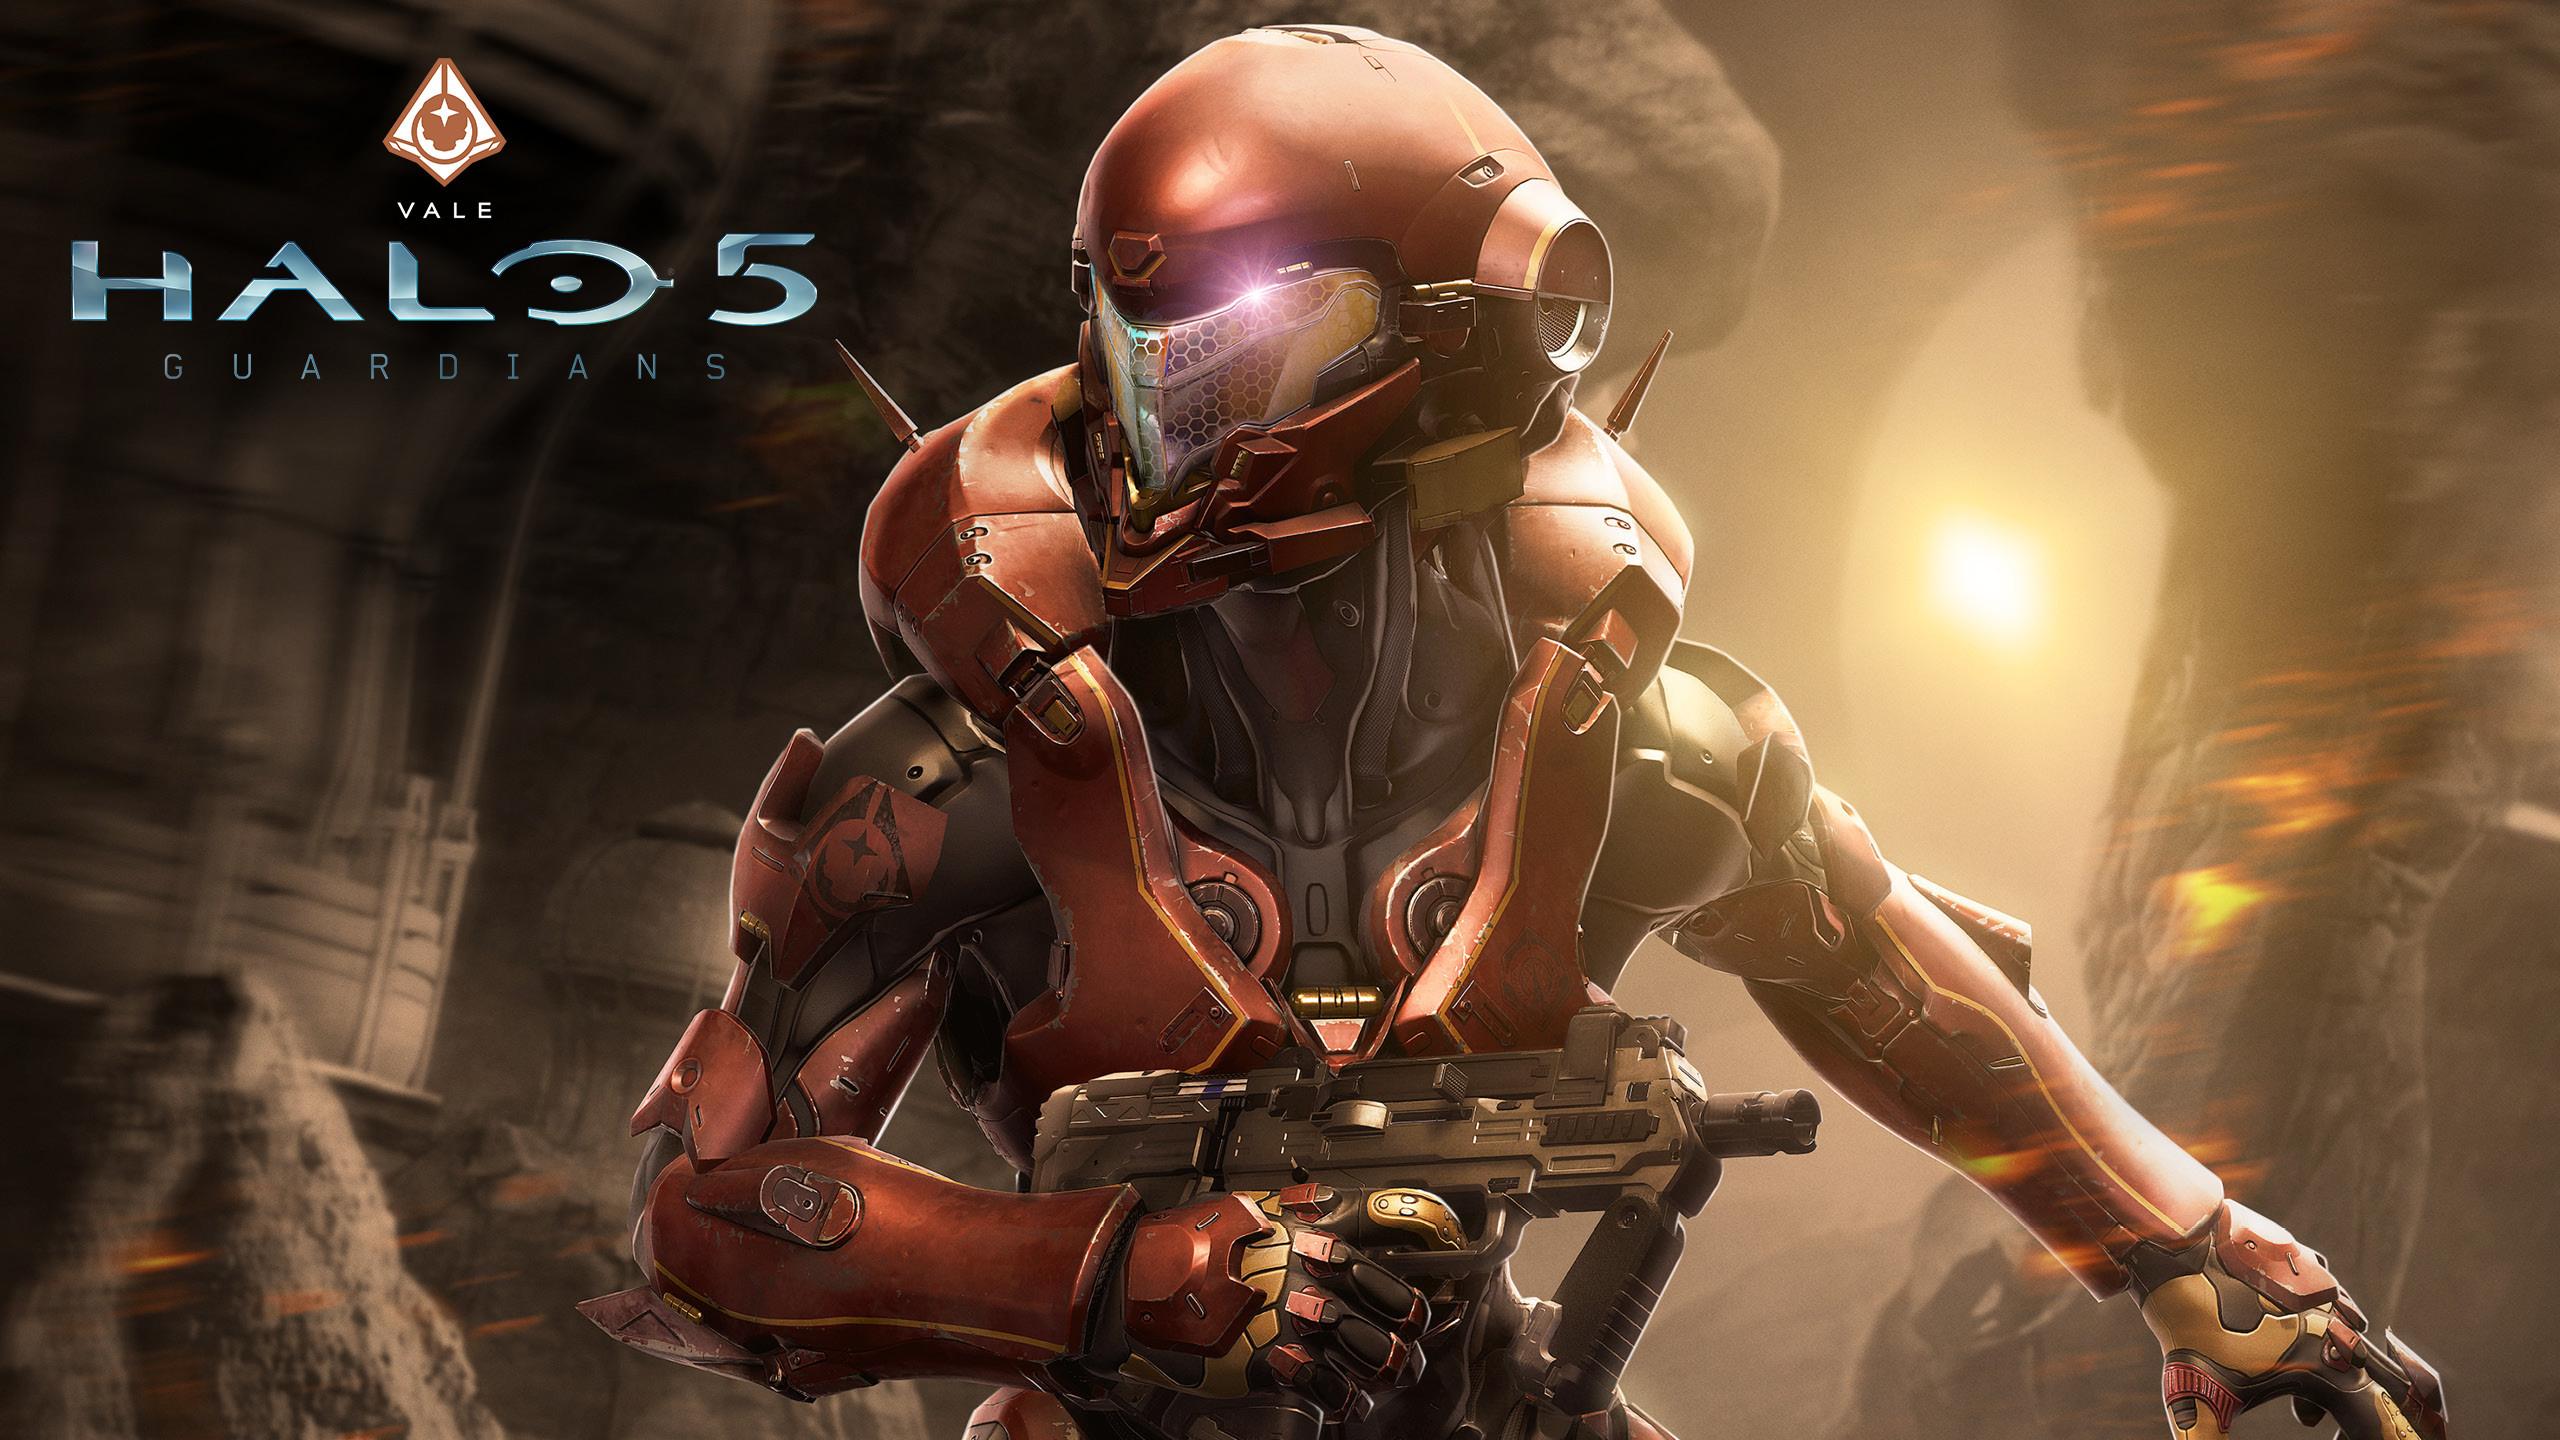 Halo 5 Guardians Wallpaper!